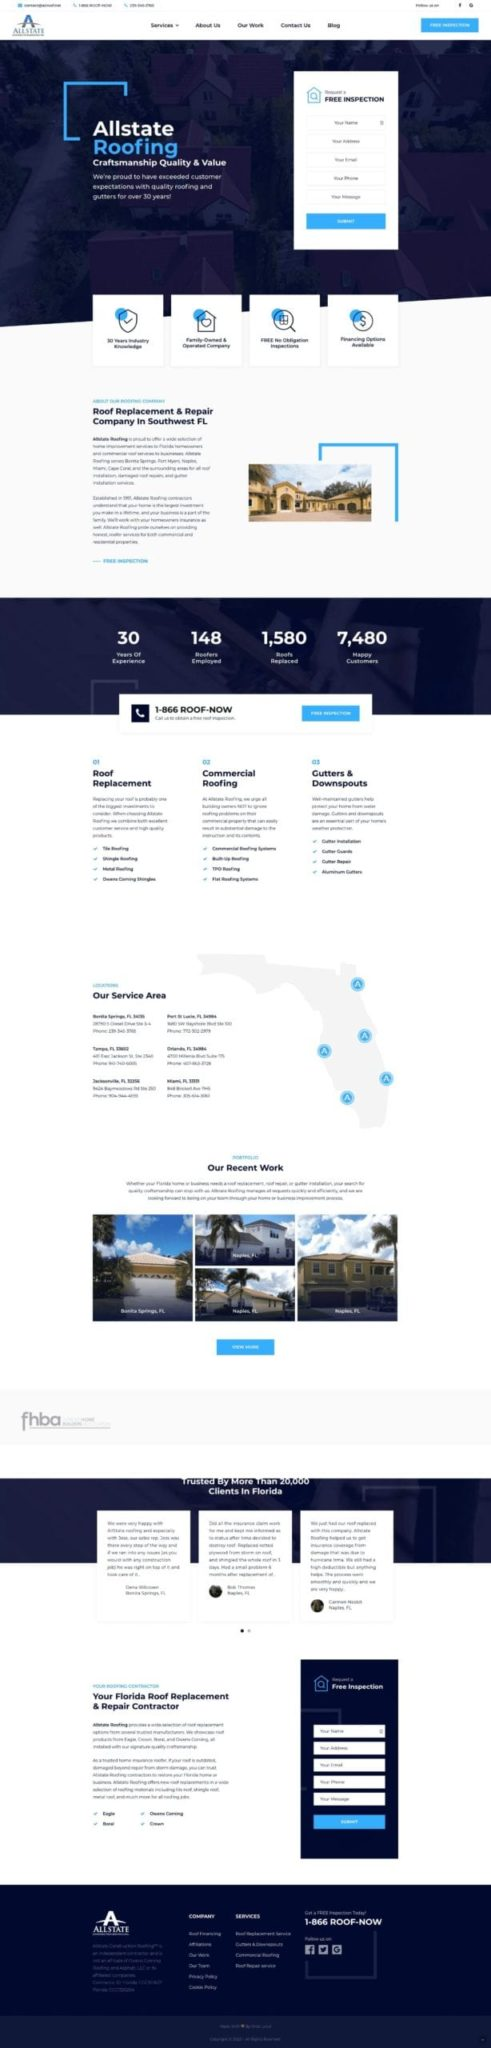 Allstate Construction Roofing Website Design